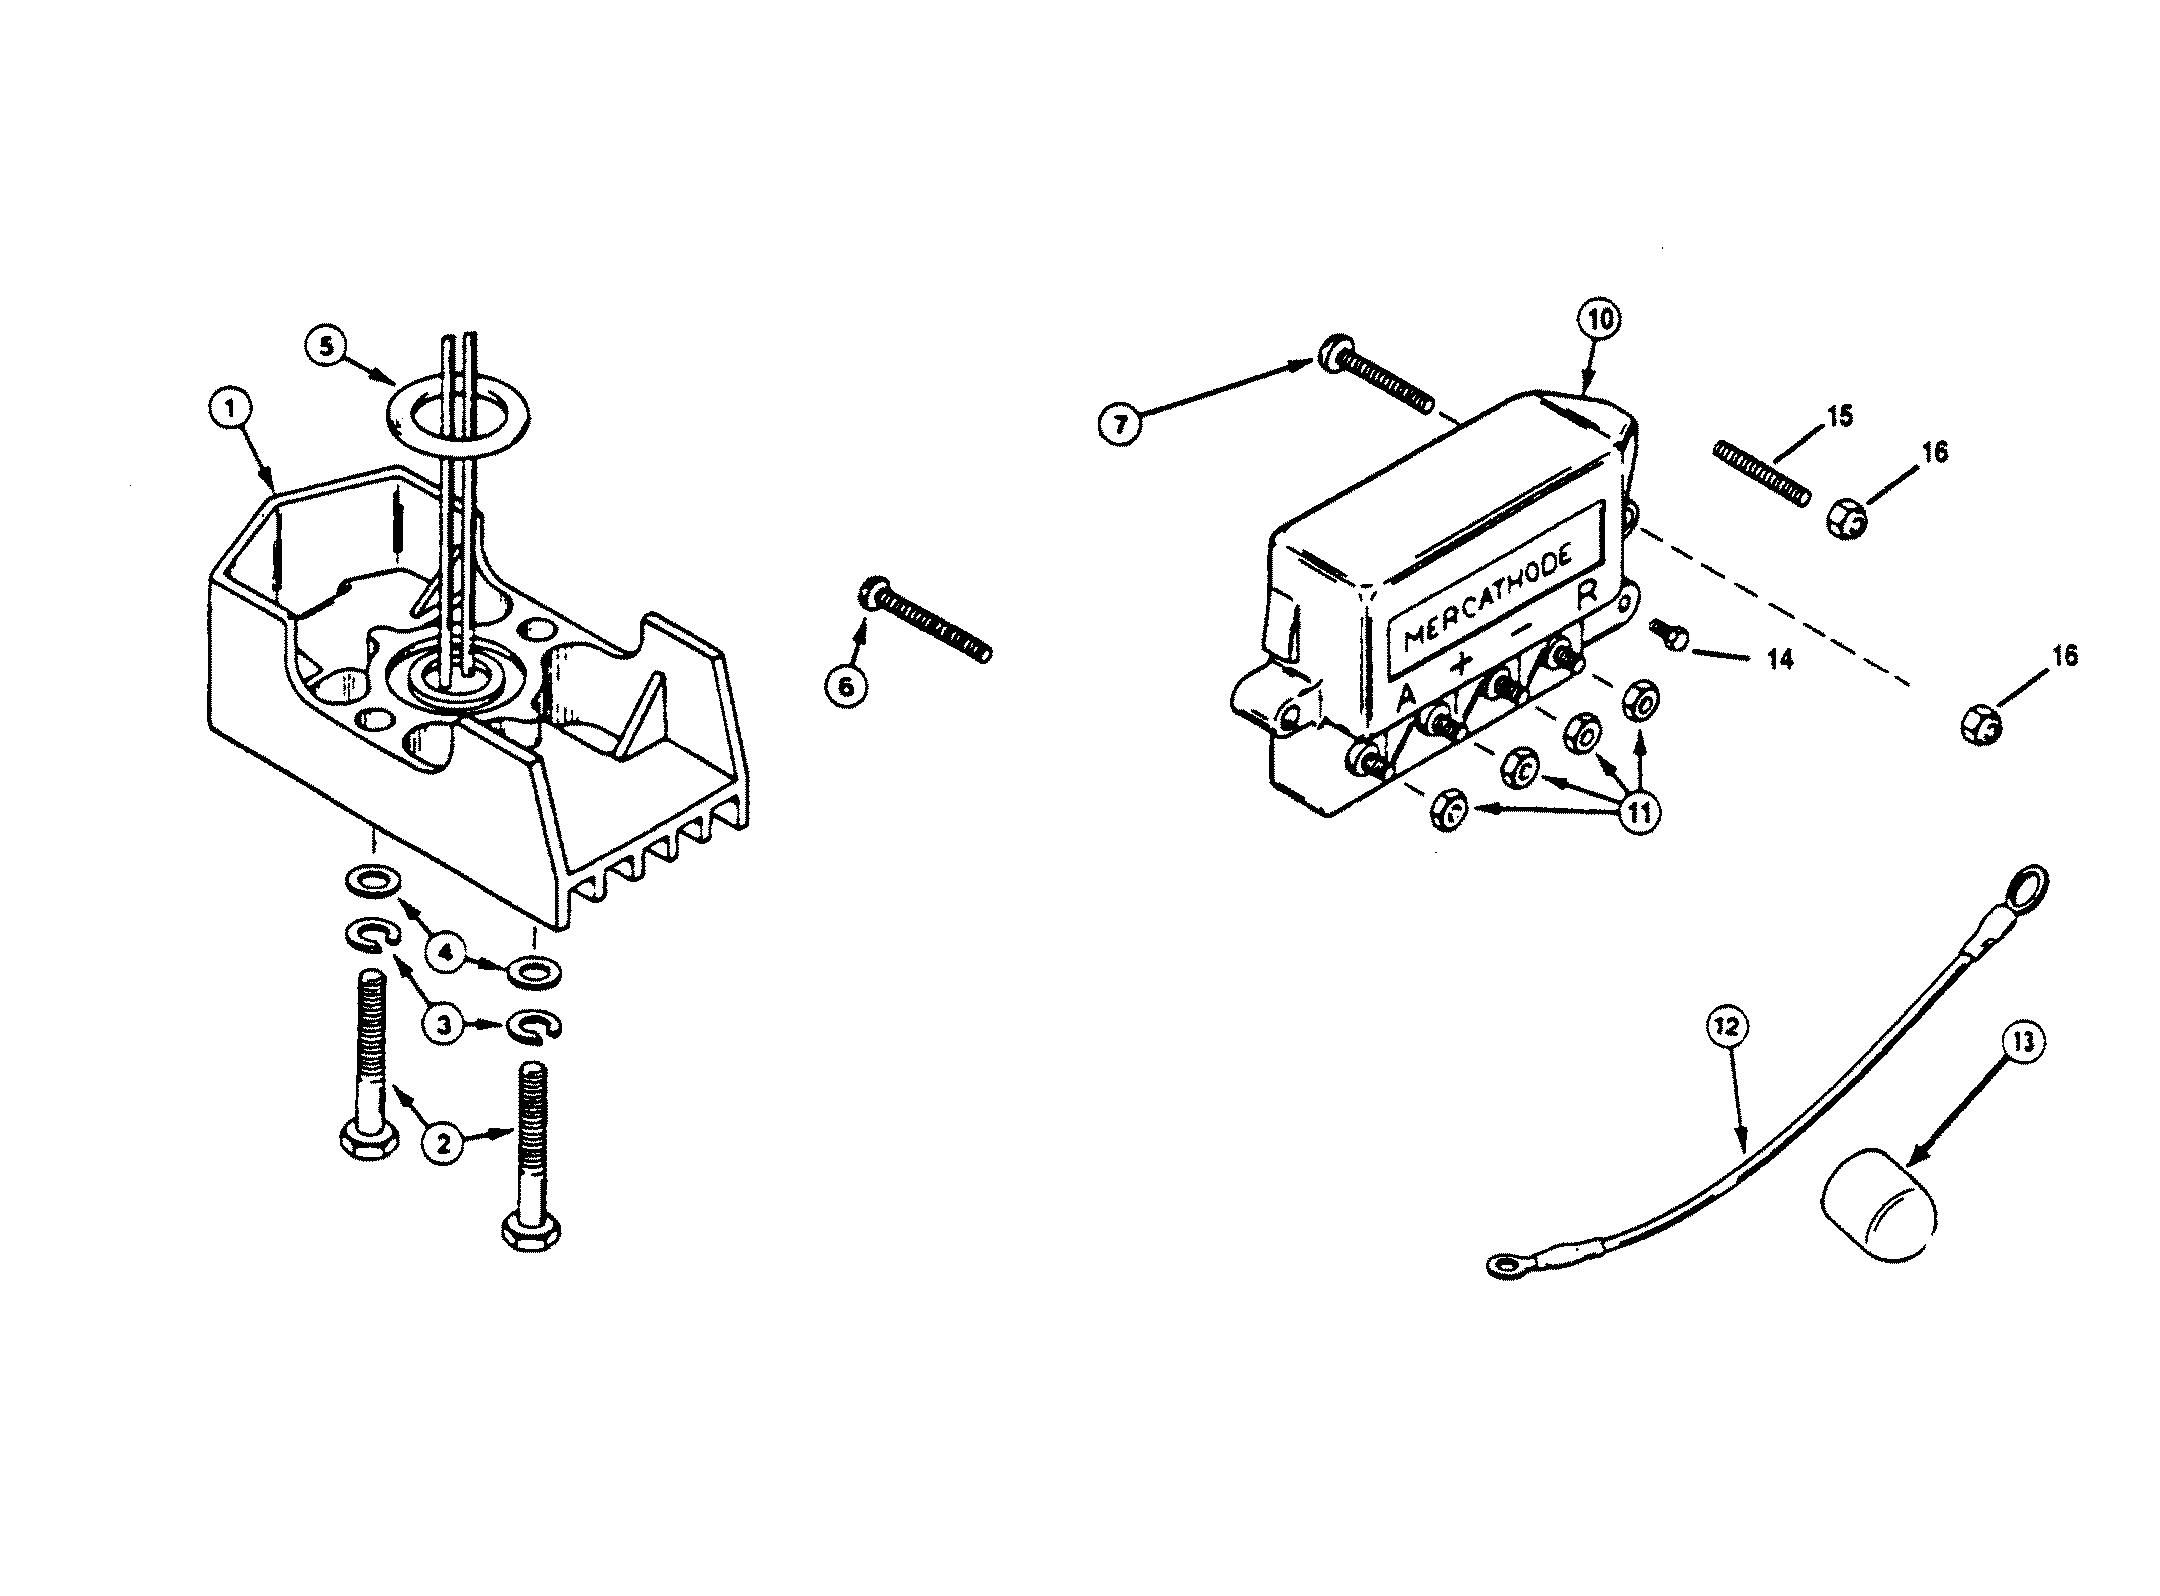 351 ford marine alternator wiring diagram